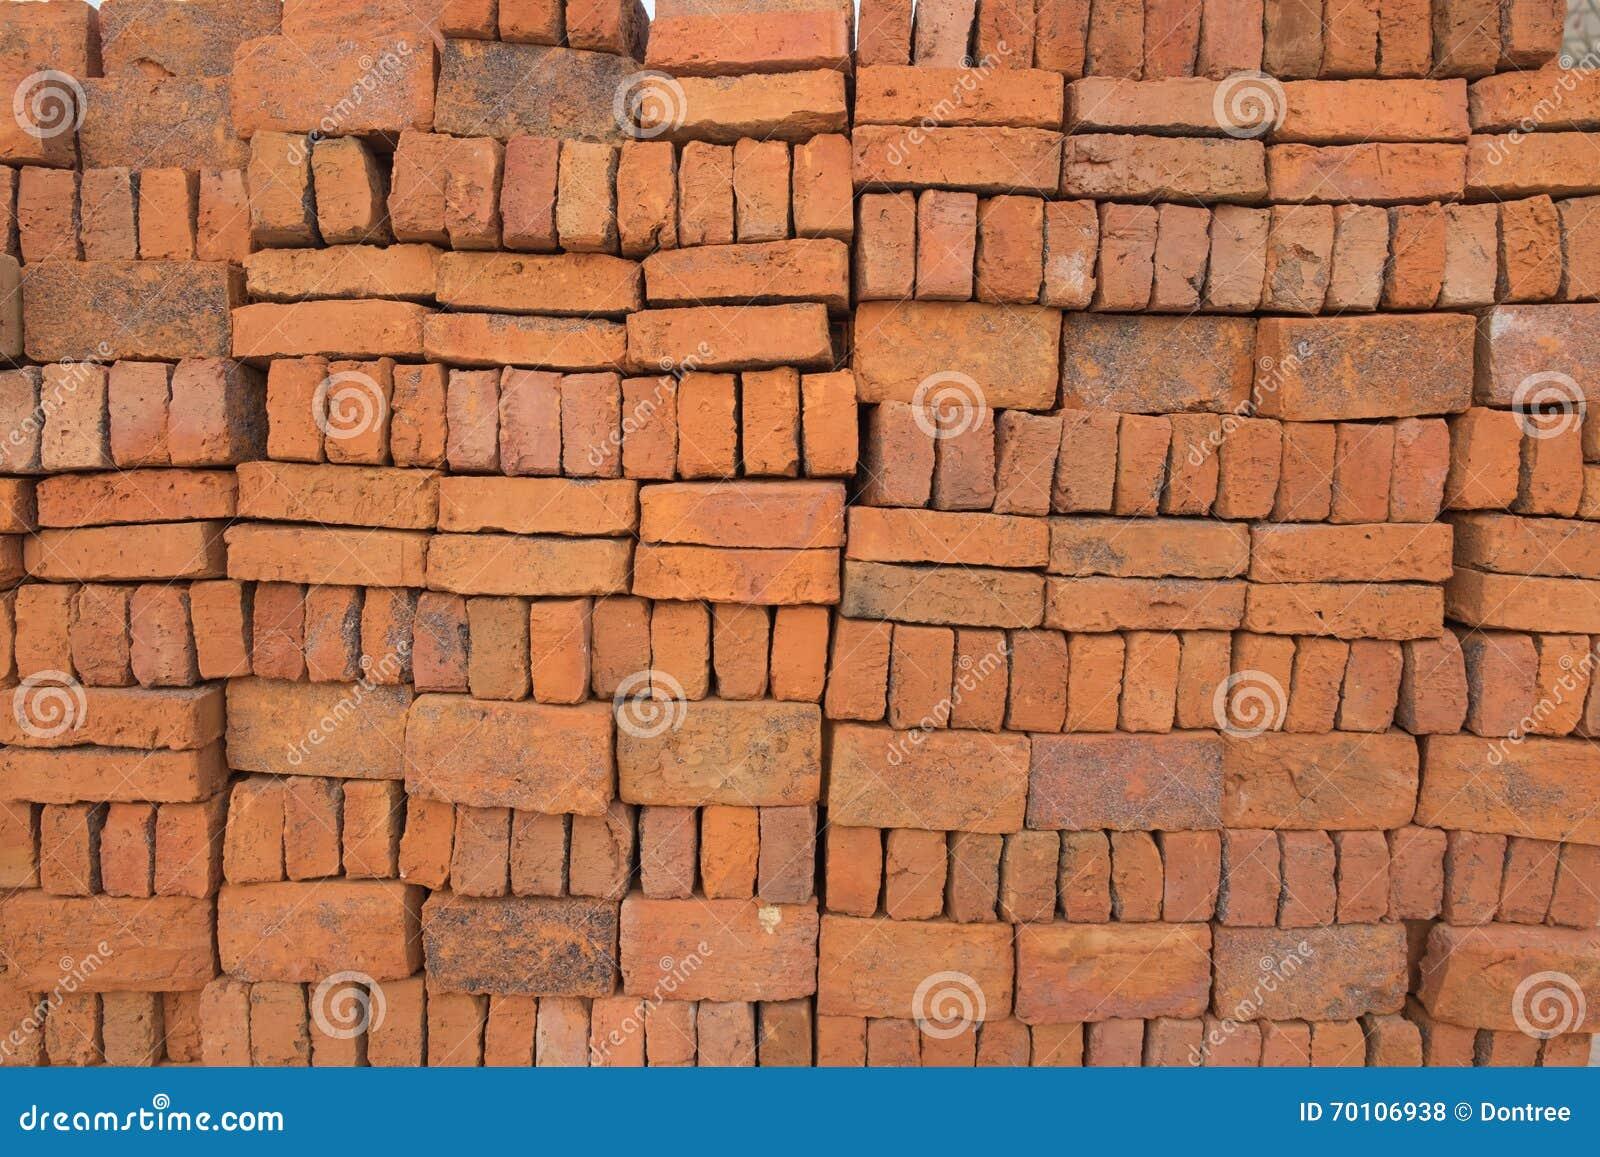 Bricks stacked /Bricks background